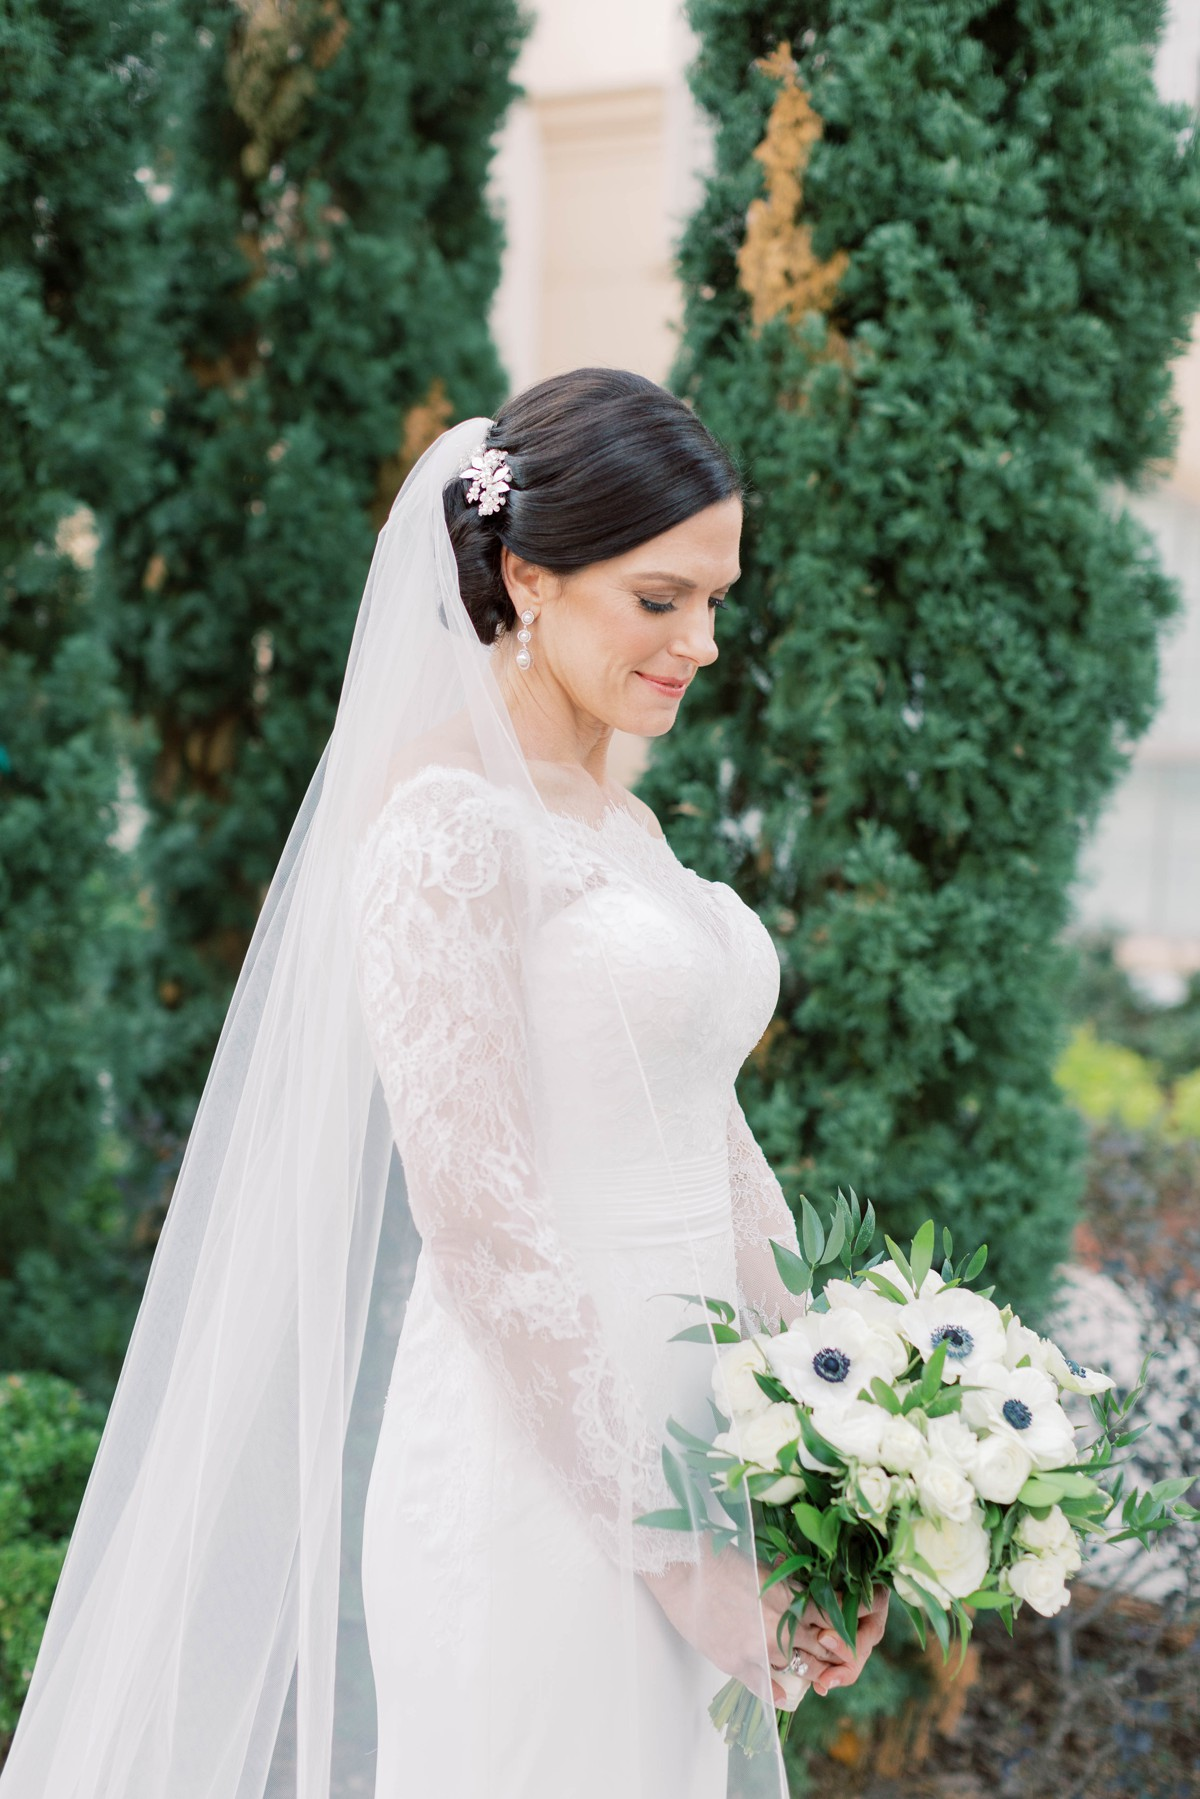 Alfond-Inn-Wedding-Winter-Park-Wedding-Photographer-Chantell-Rae-Photography_0029.jpg